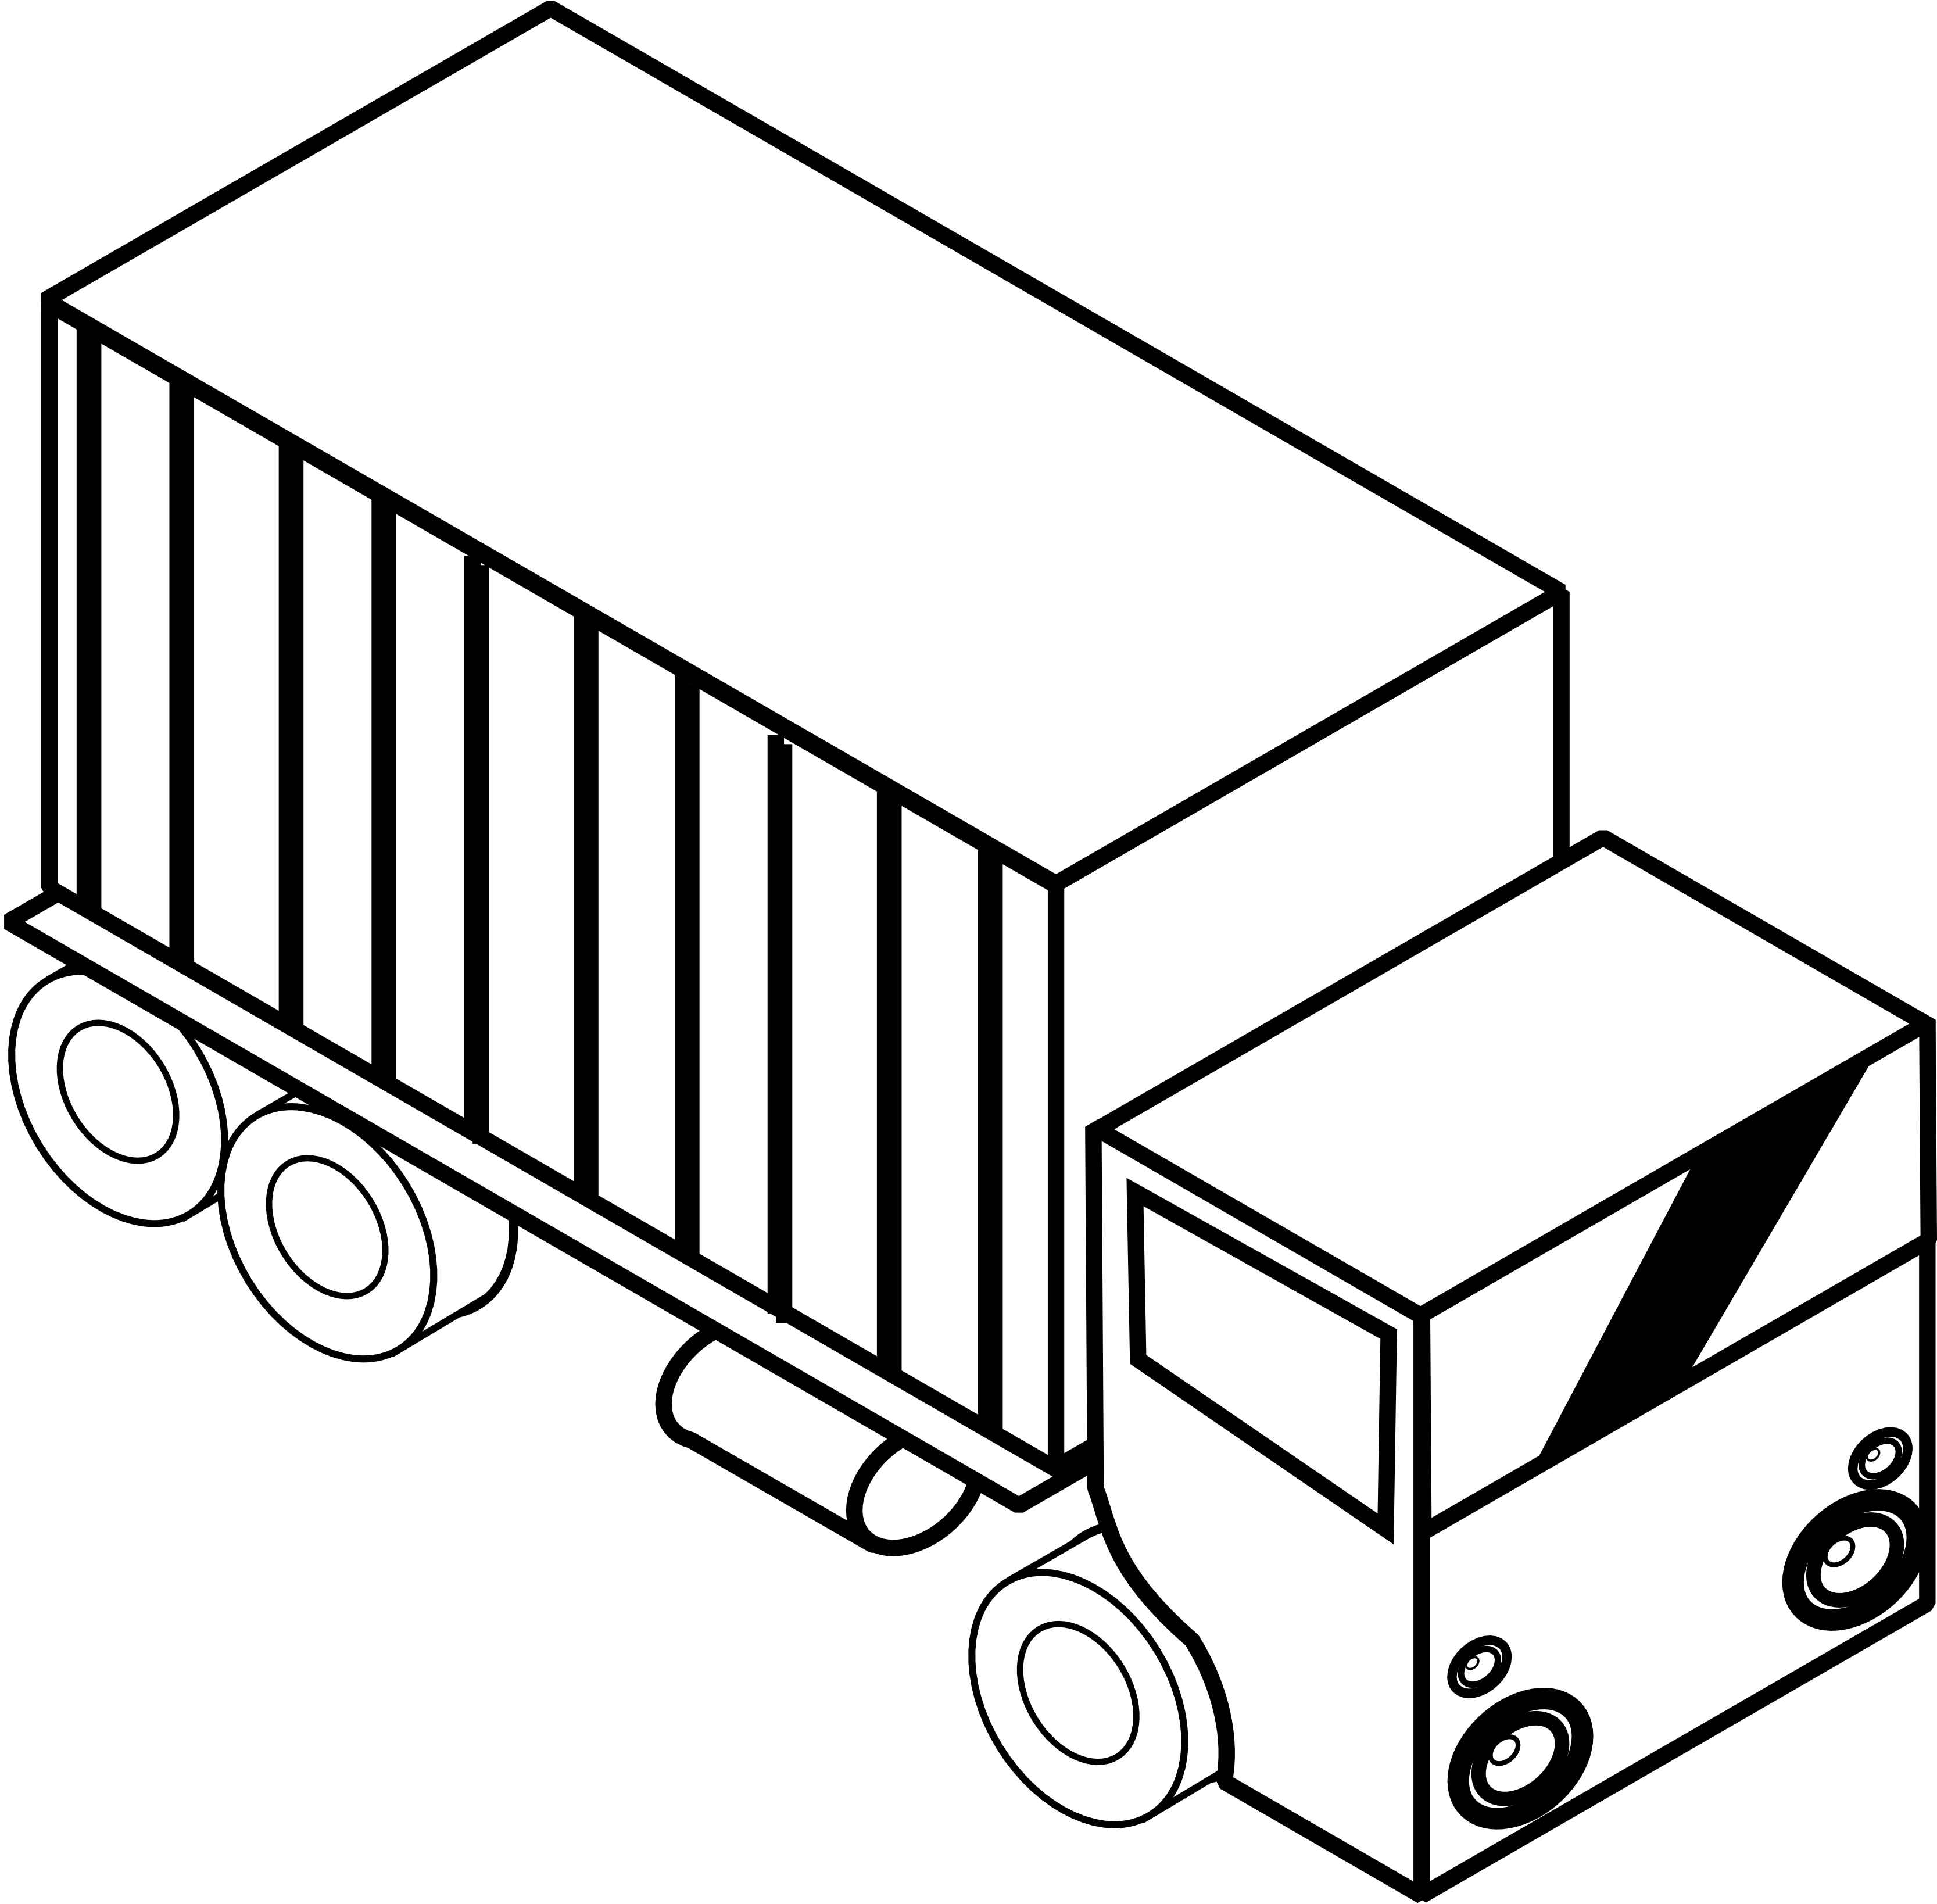 White clipart lorry White Clipart Clipart Black Clipart